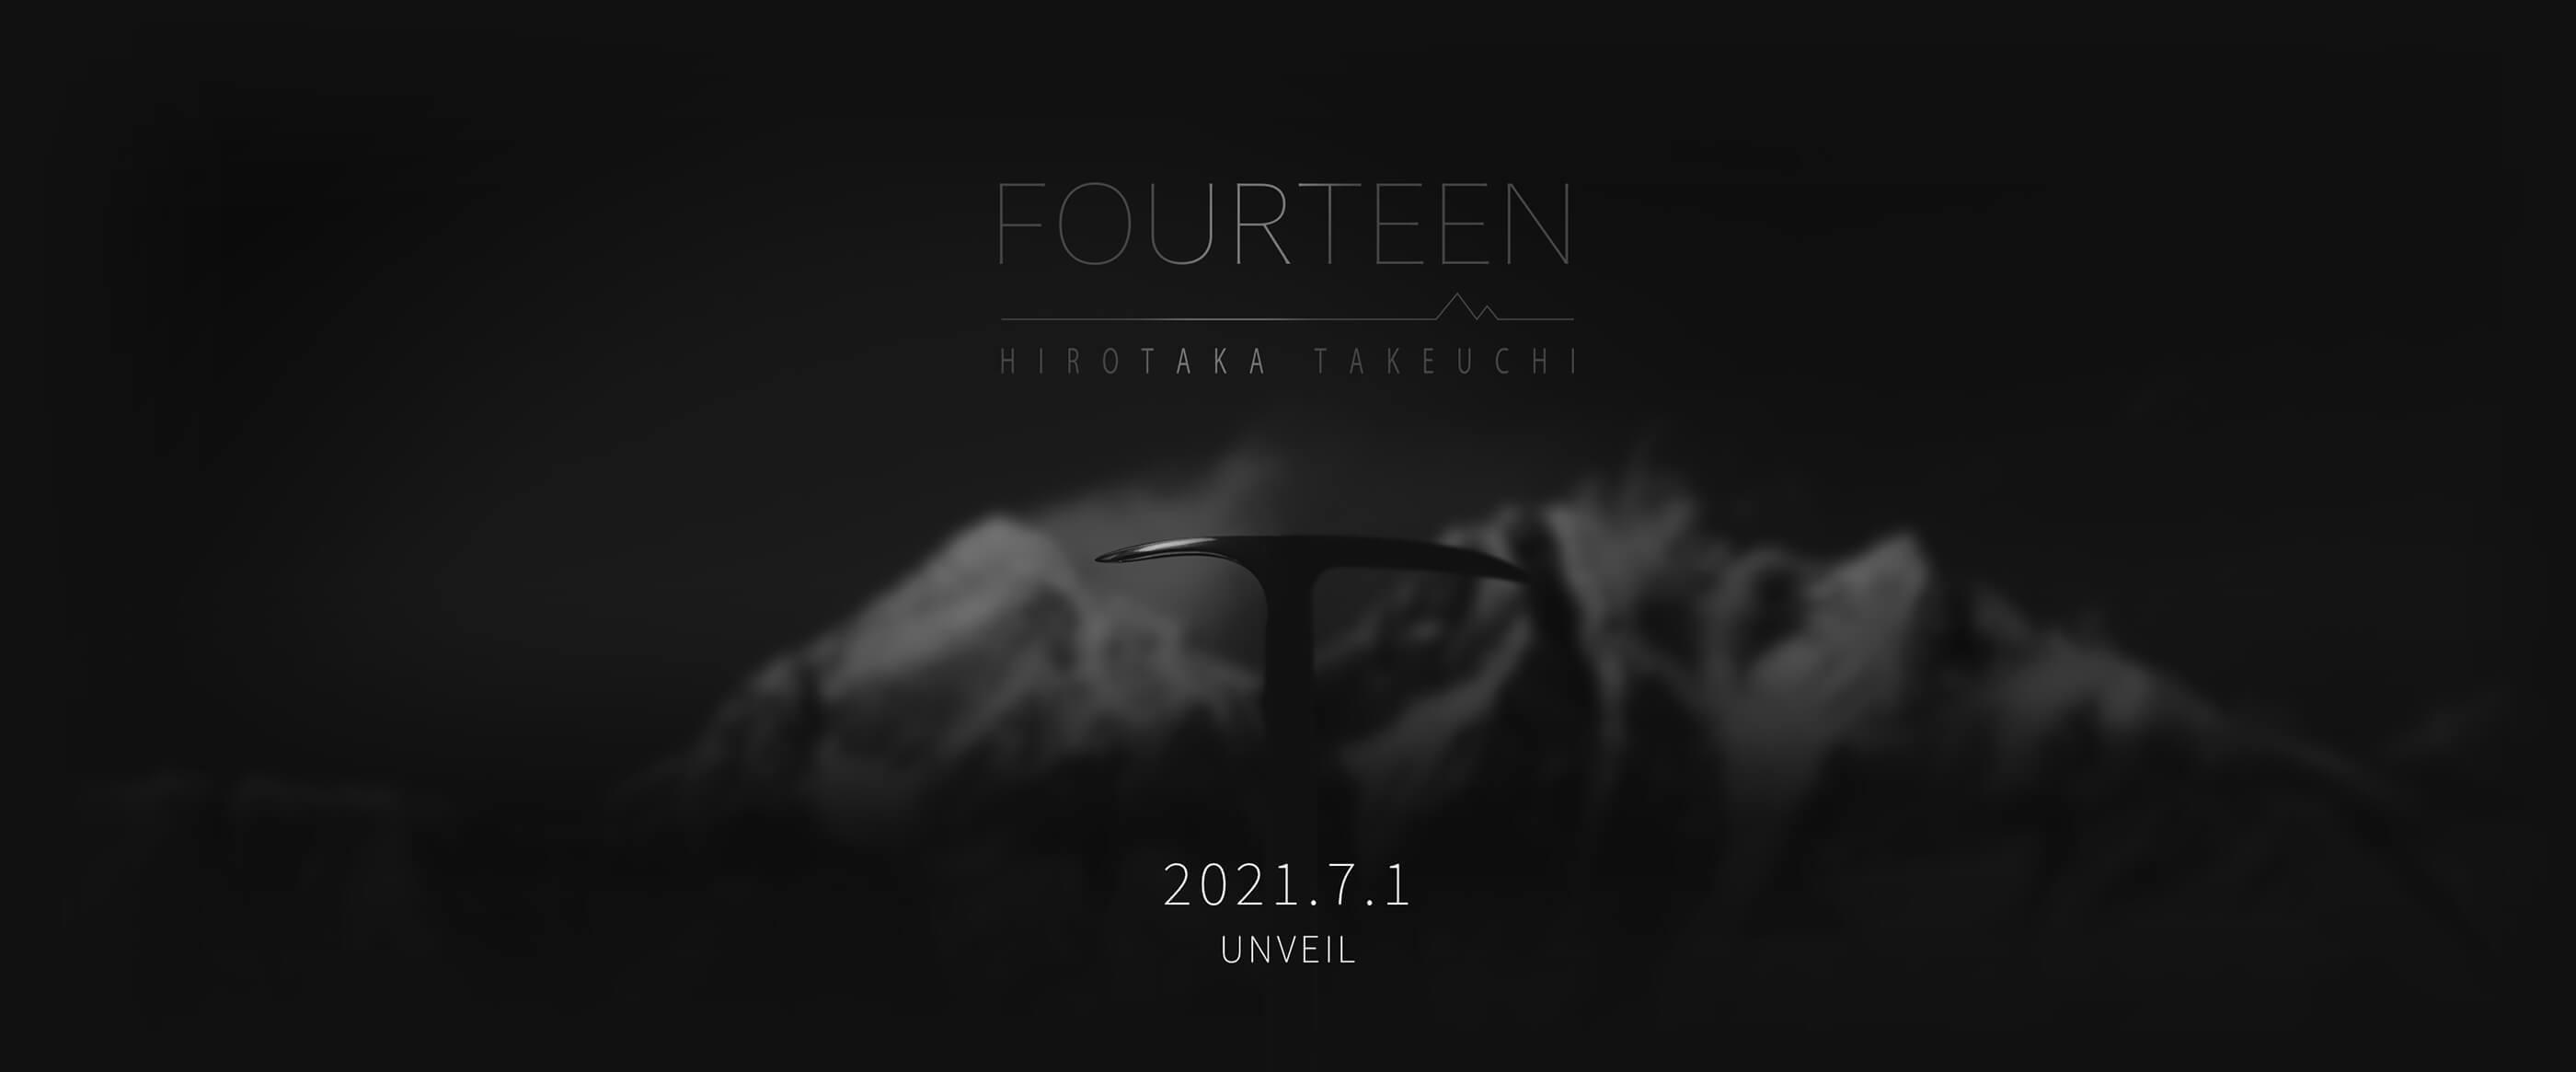 FORTEEN HIROTAKA TAKEUCHI 2021.7.1 UNVEIL